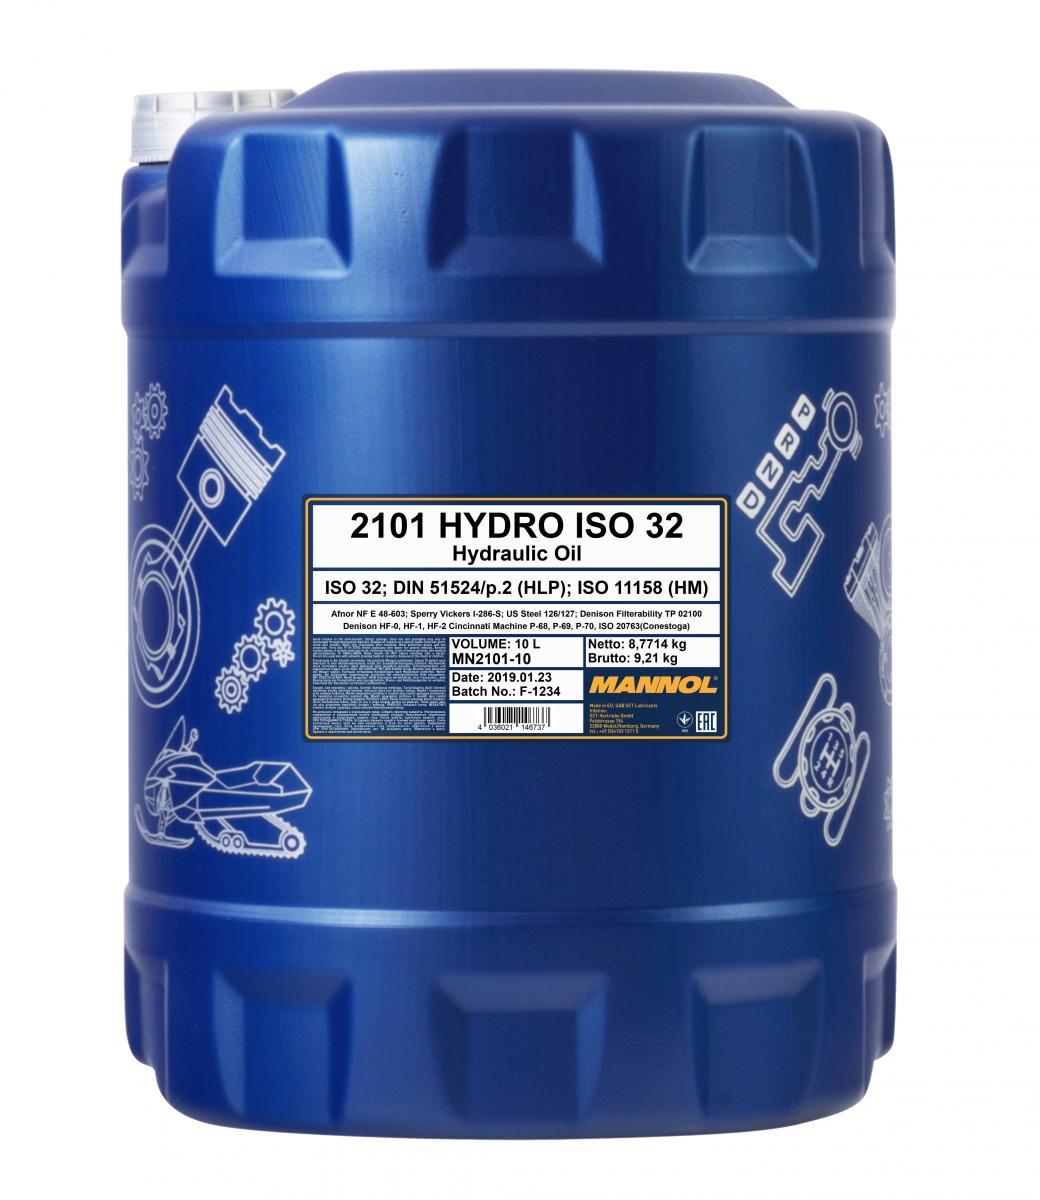 Hydro ISO 32